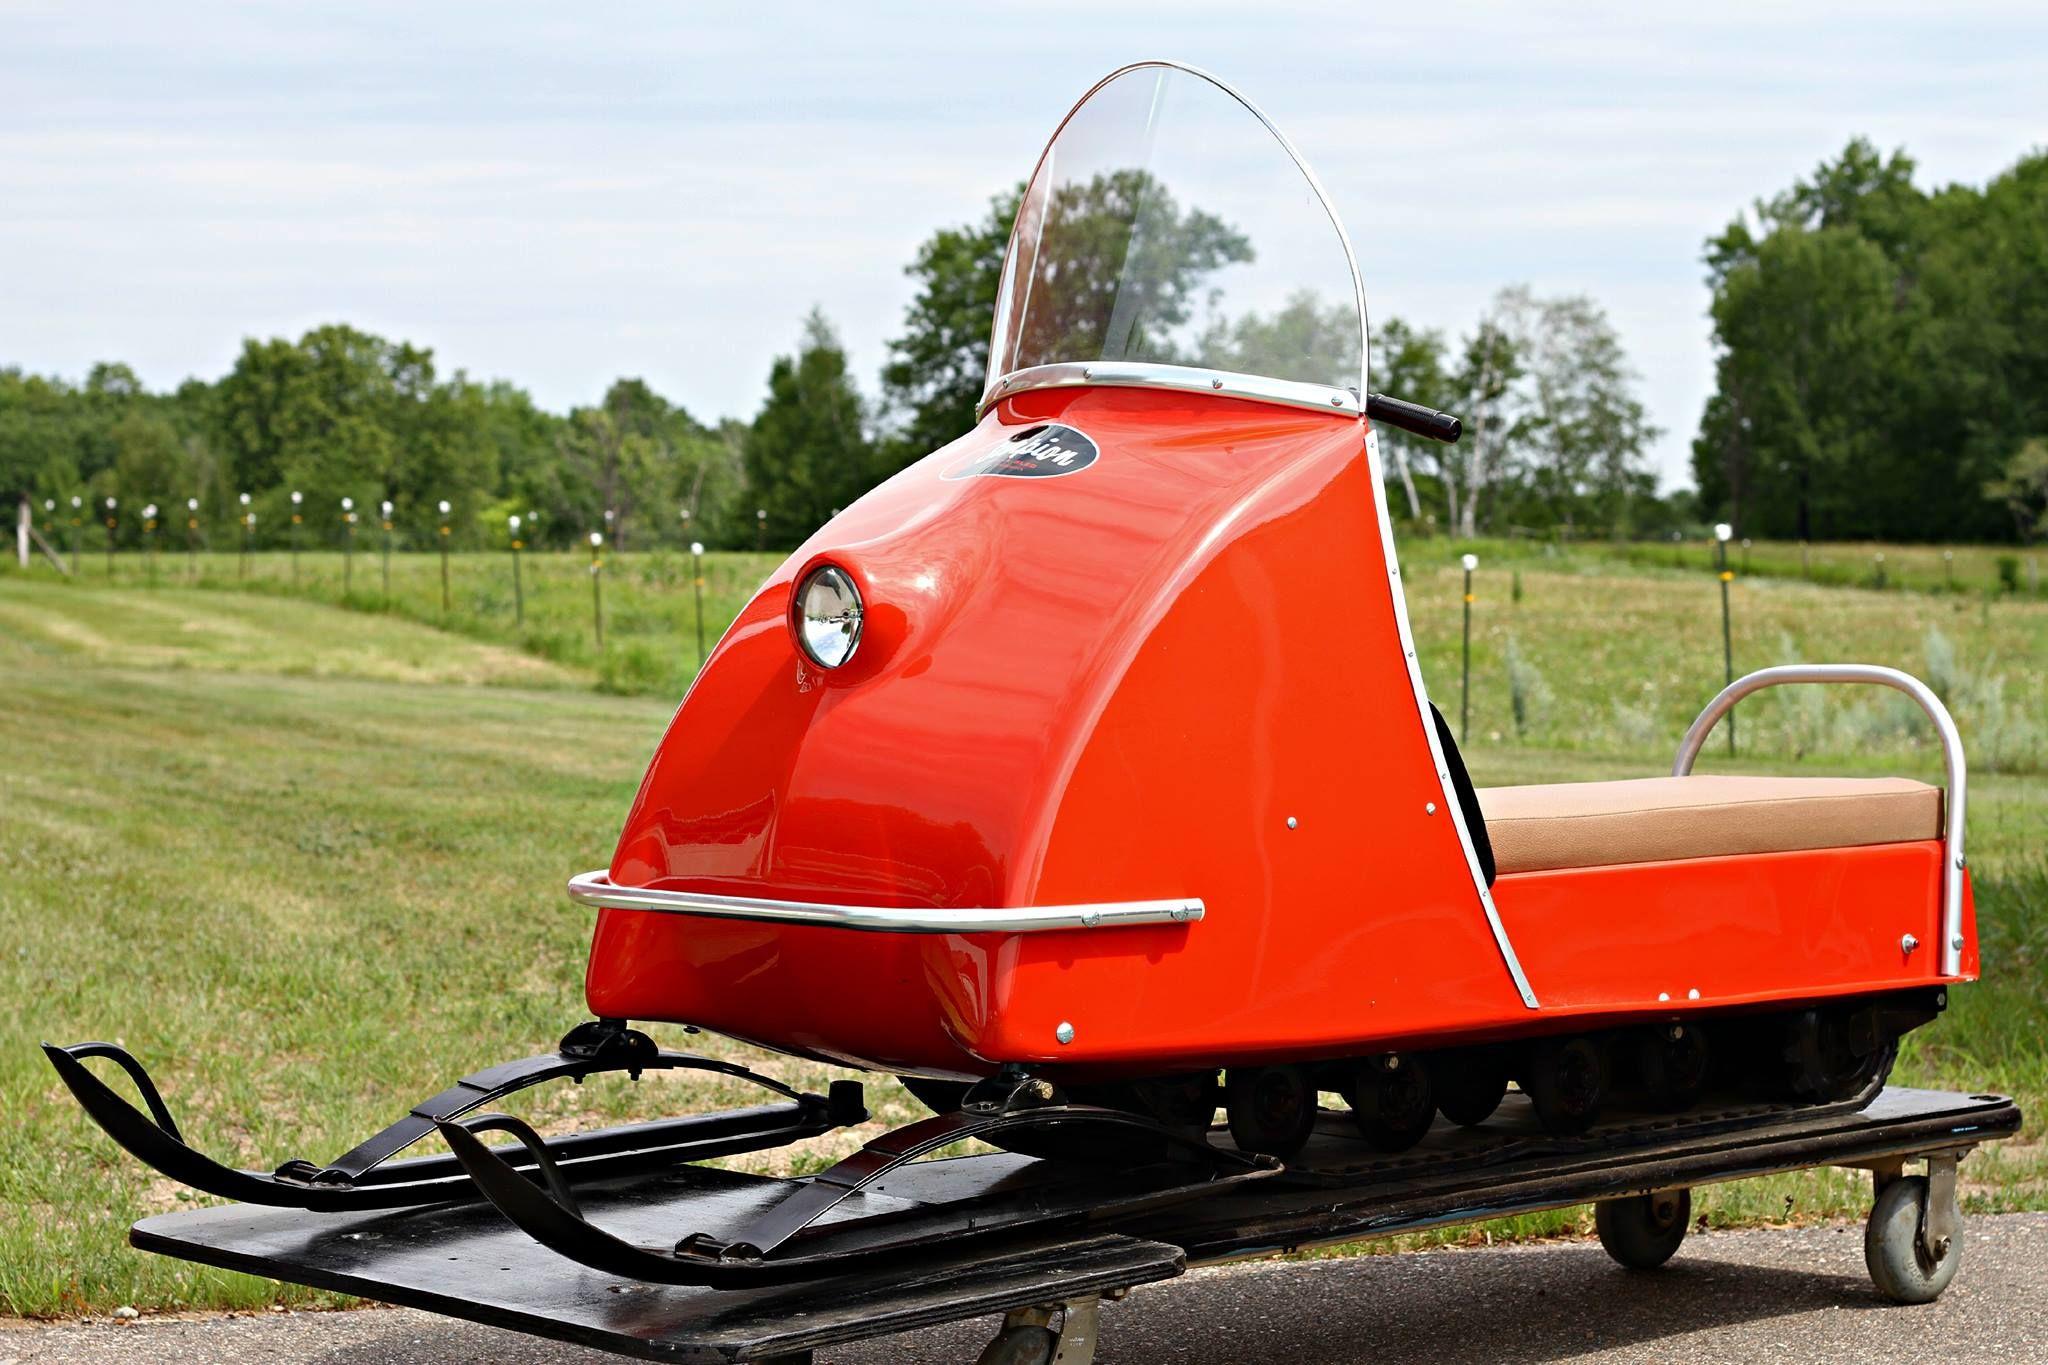 1969 Scorpion Stinger Snowmobile